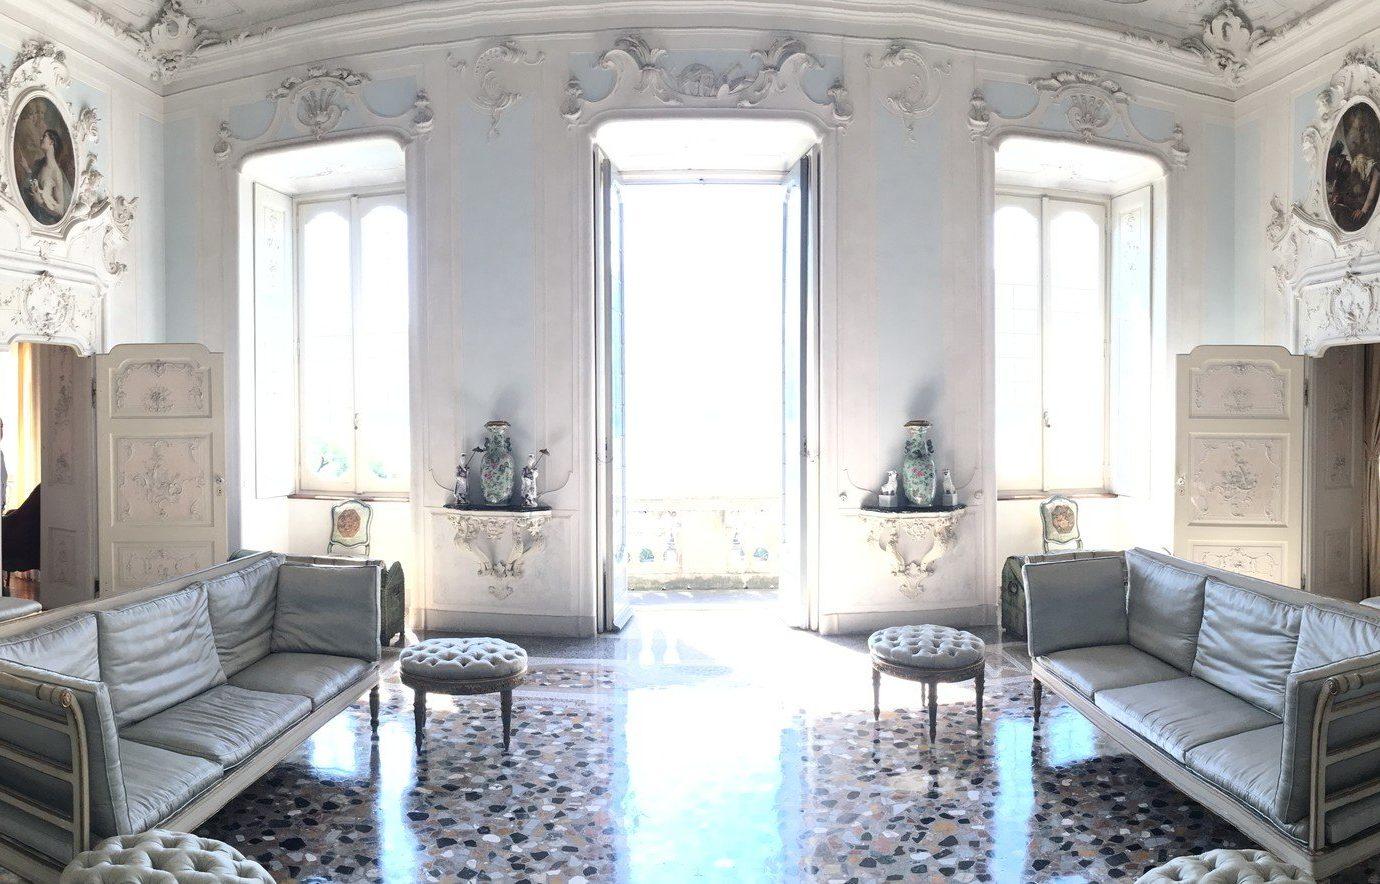 Hotels Luxury Travel indoor floor room Living column interior design furniture building estate ceiling chapel facade window arch decorated